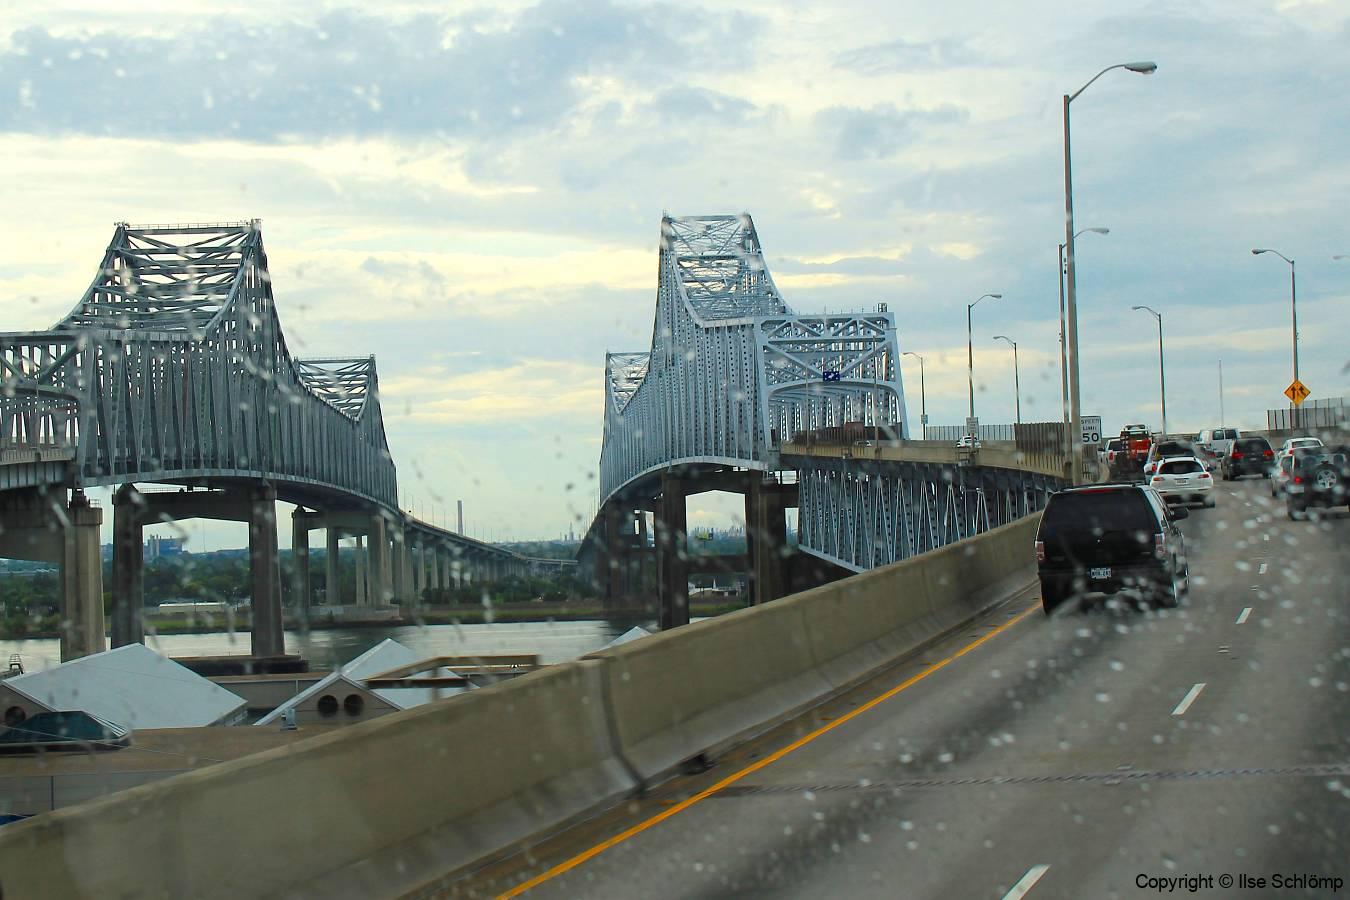 USA, Louisiana, New Orleans, Mississippi River, Crescent City Connection Bridge